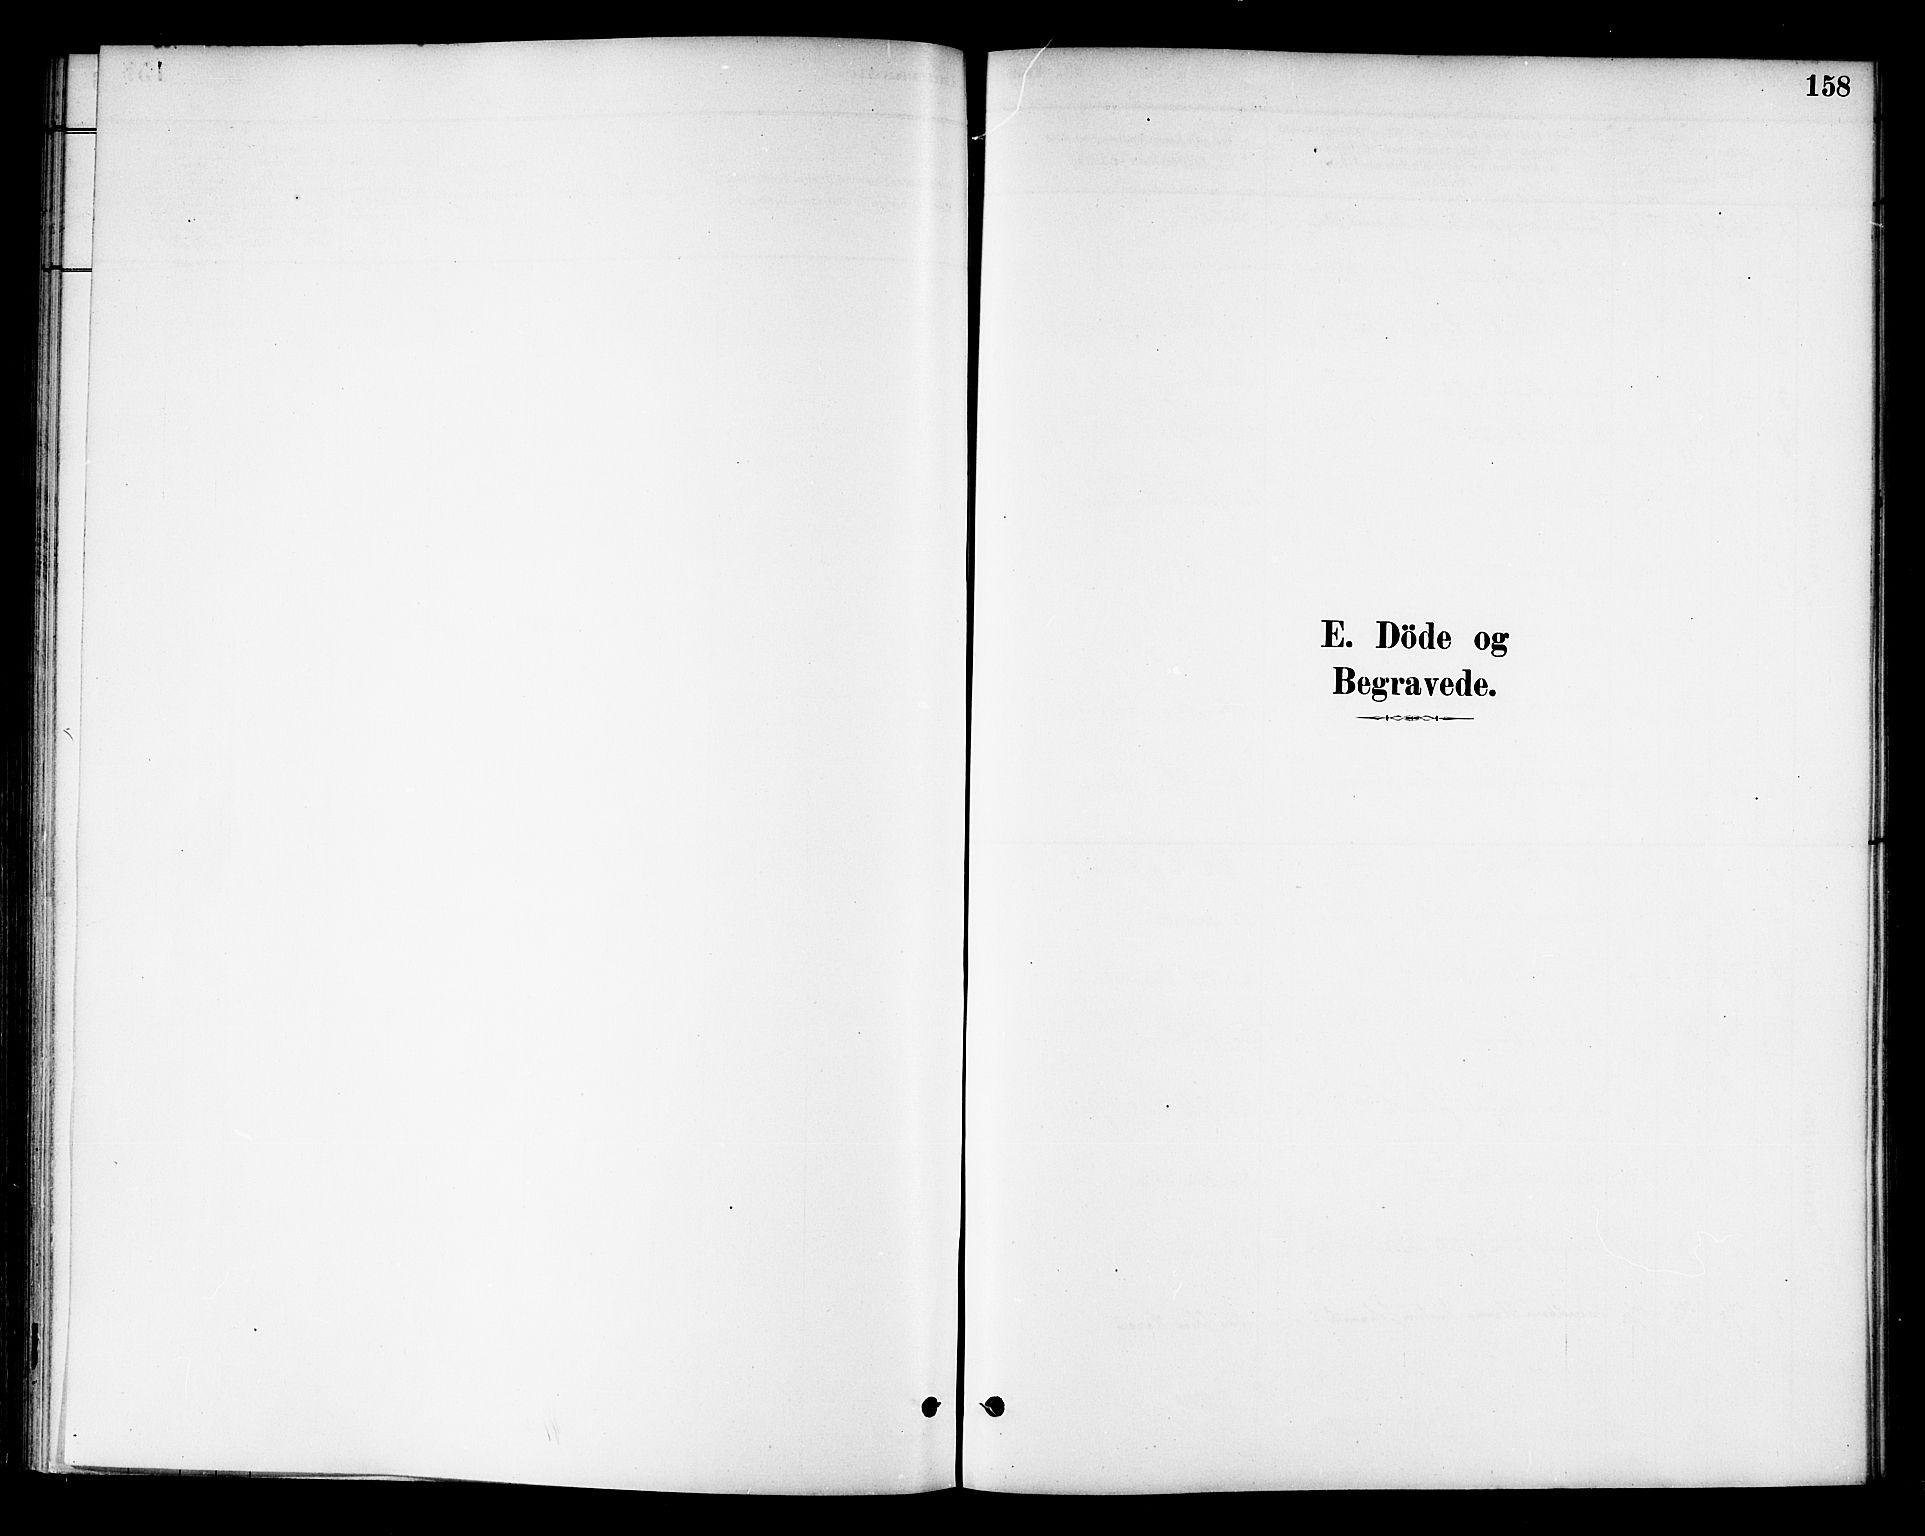 SAT, Ministerialprotokoller, klokkerbøker og fødselsregistre - Sør-Trøndelag, 654/L0663: Parish register (official) no. 654A01, 1880-1894, p. 158